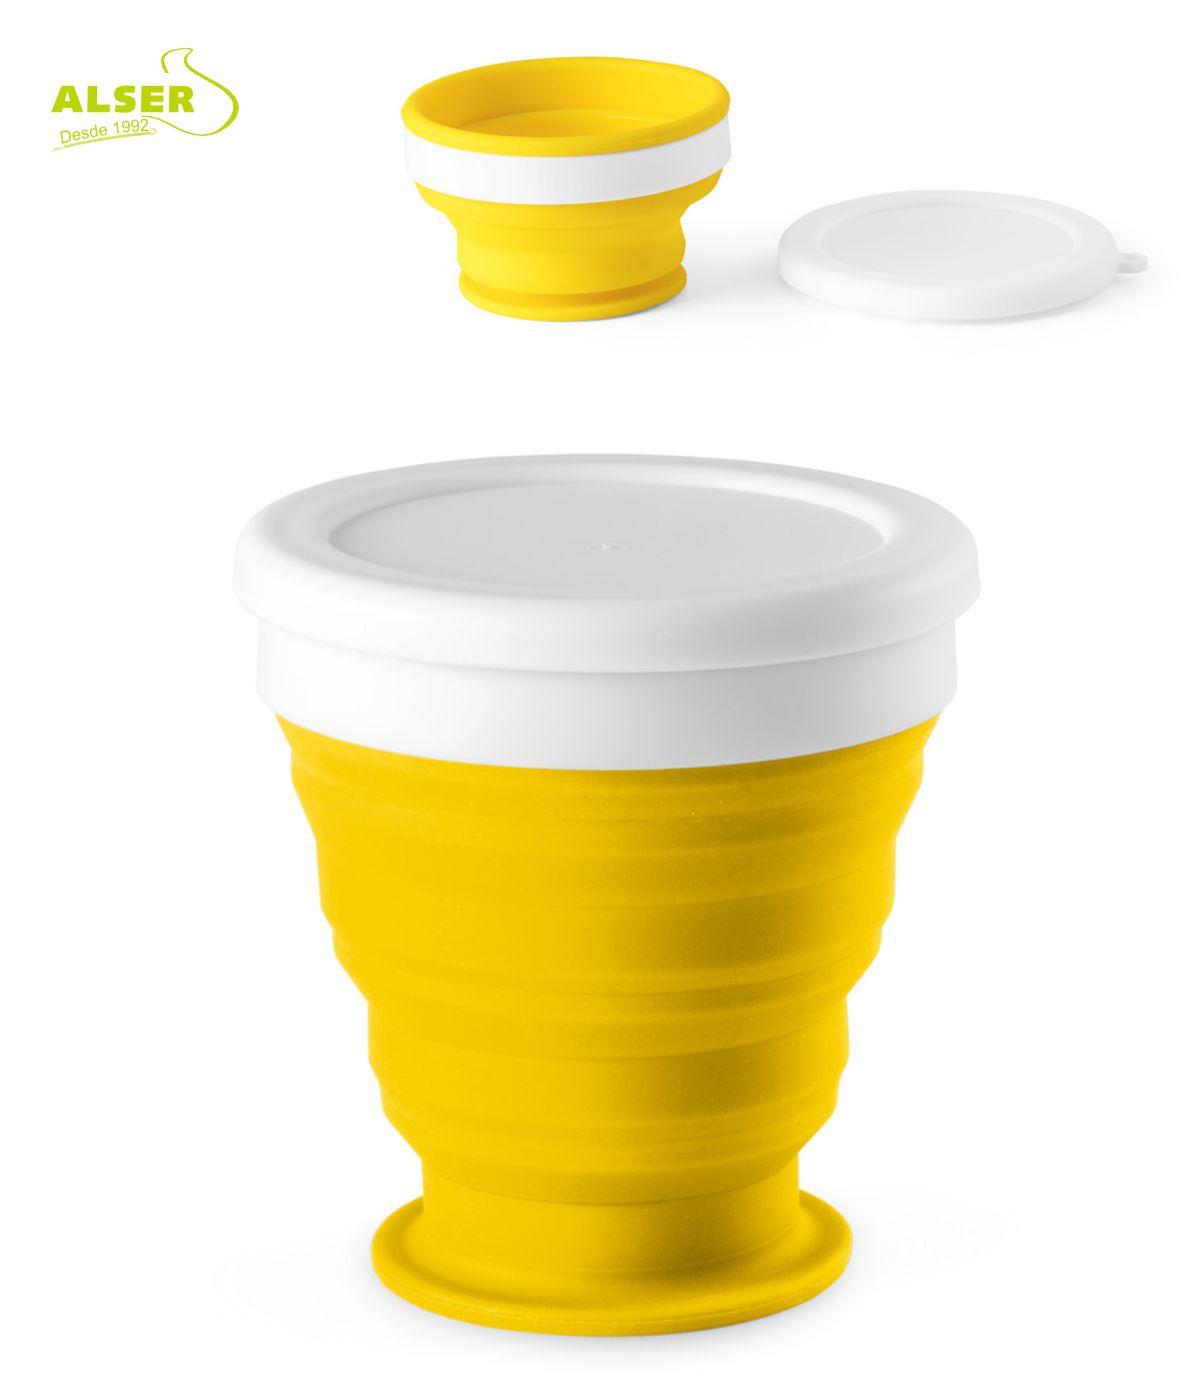 aso plegable de silicona Amarillo